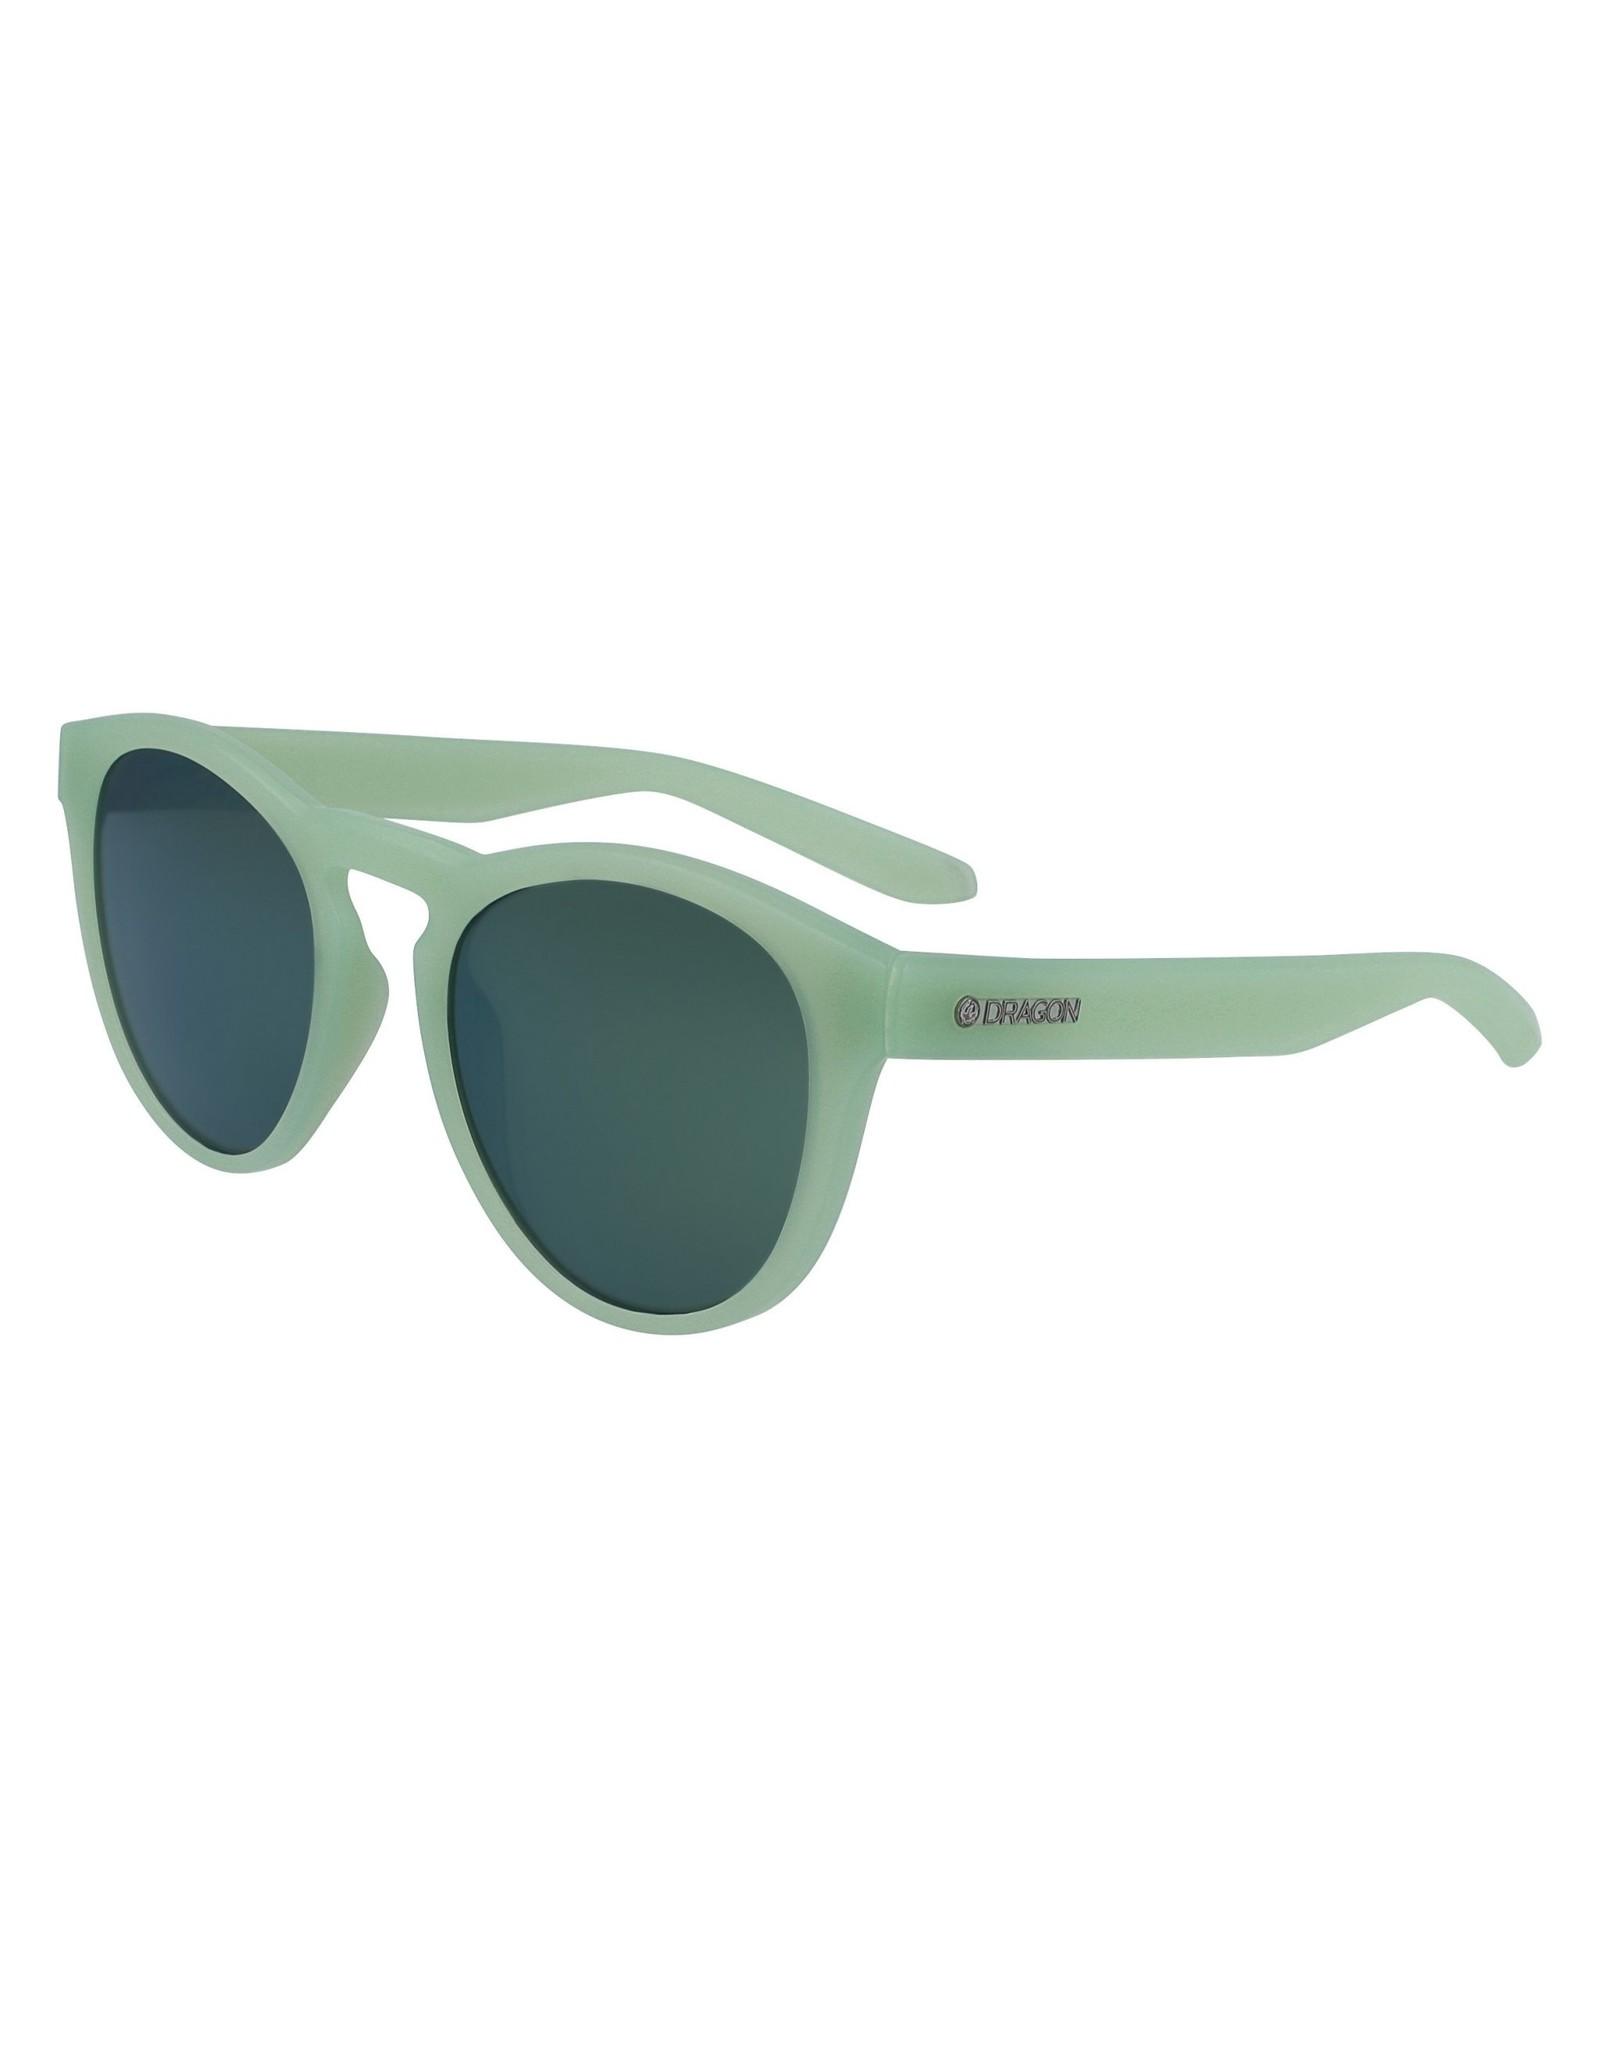 DRAGON Opus LL ION Matte Seafoam/Petrolion Sunglasses